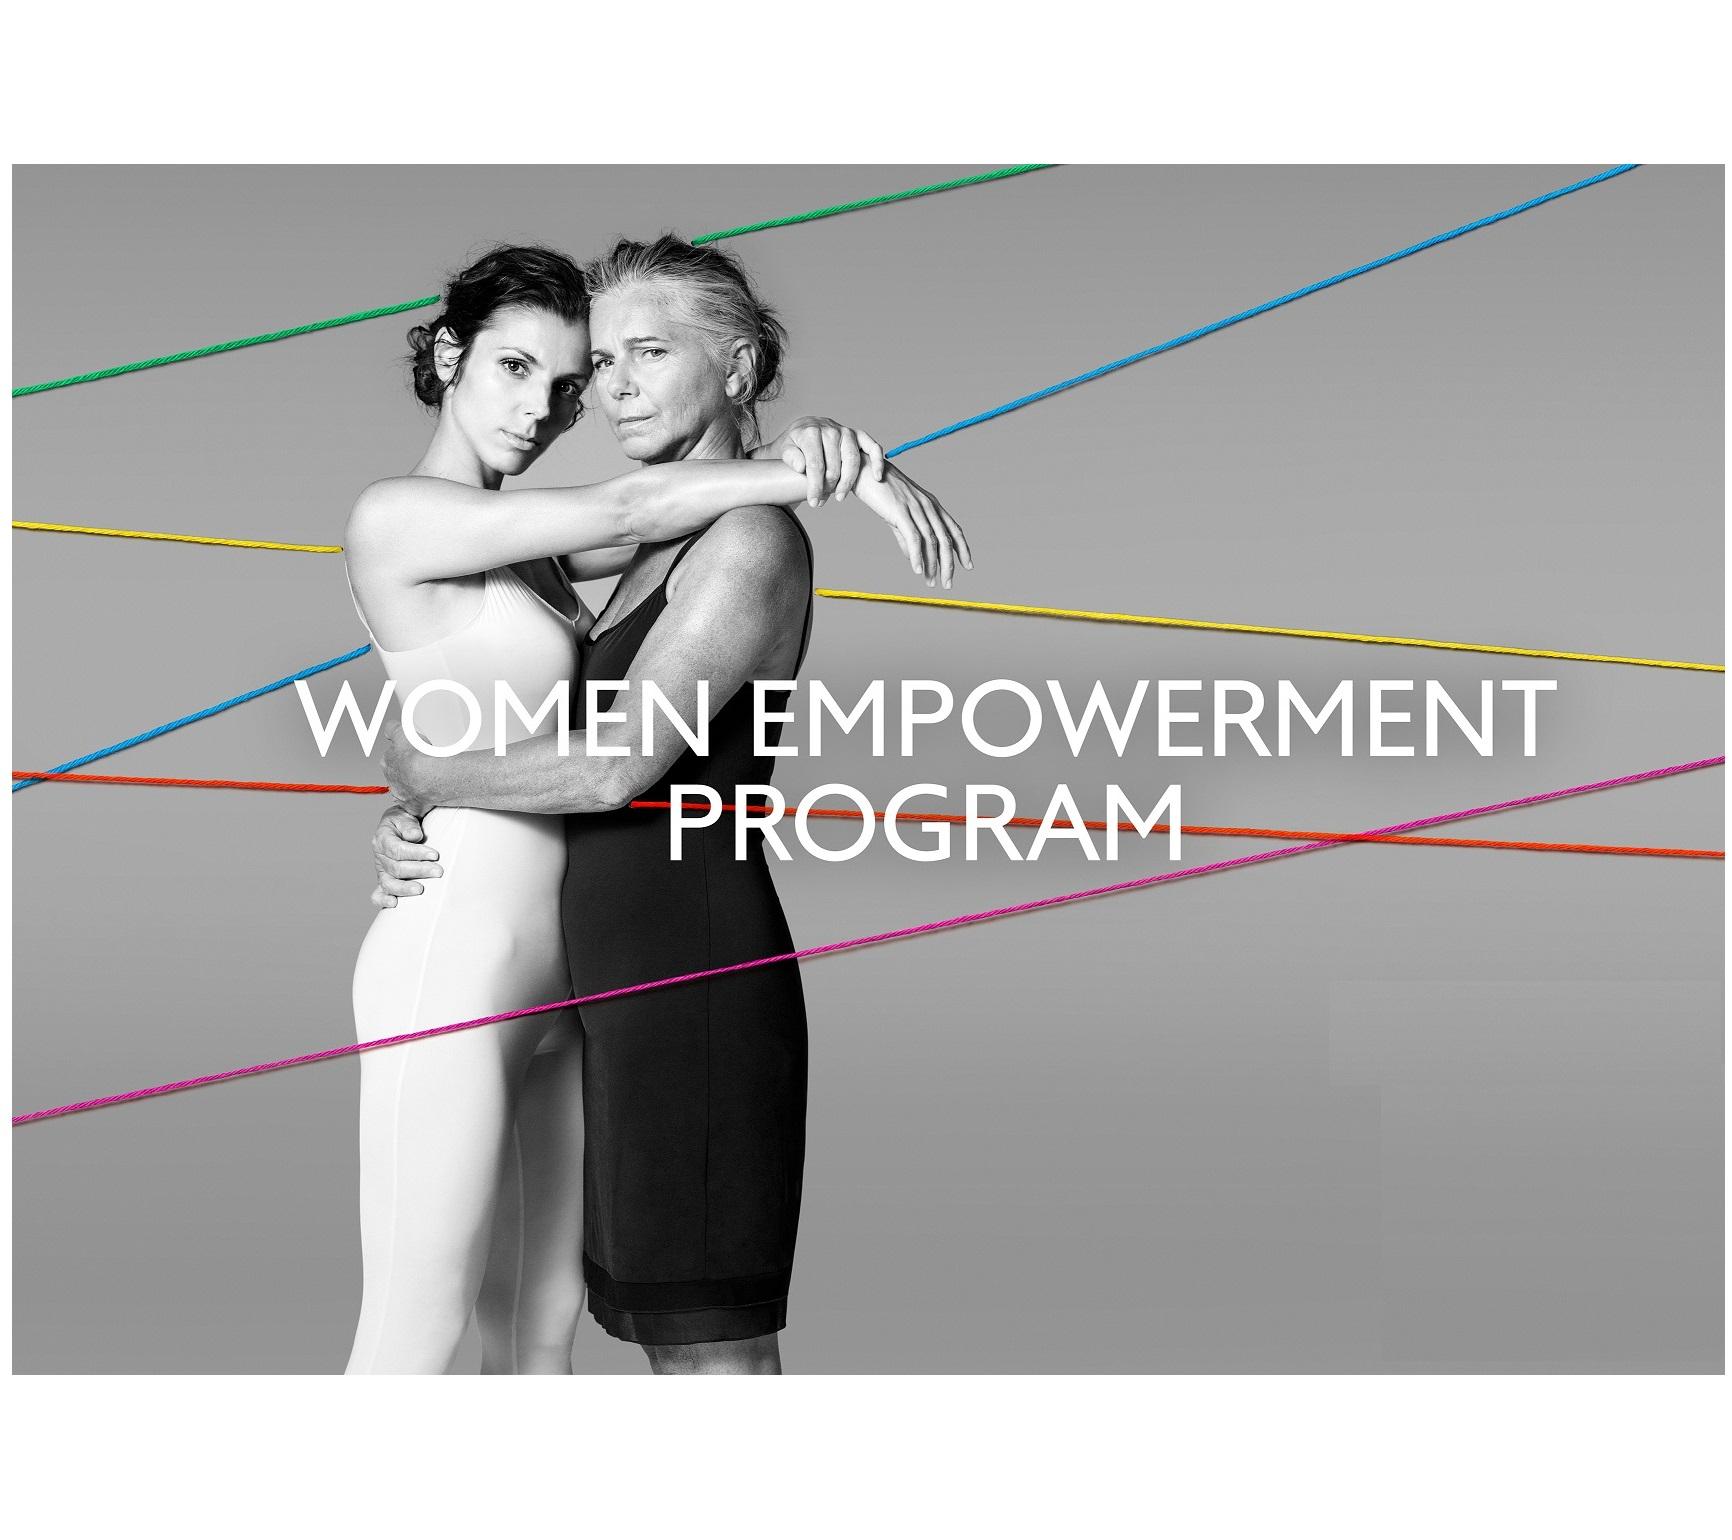 https://www.promotionmagazine.it/wp/wp-content/uploads/2016/10/WomenEmpowermentProgram_orizzontale-4.jpg